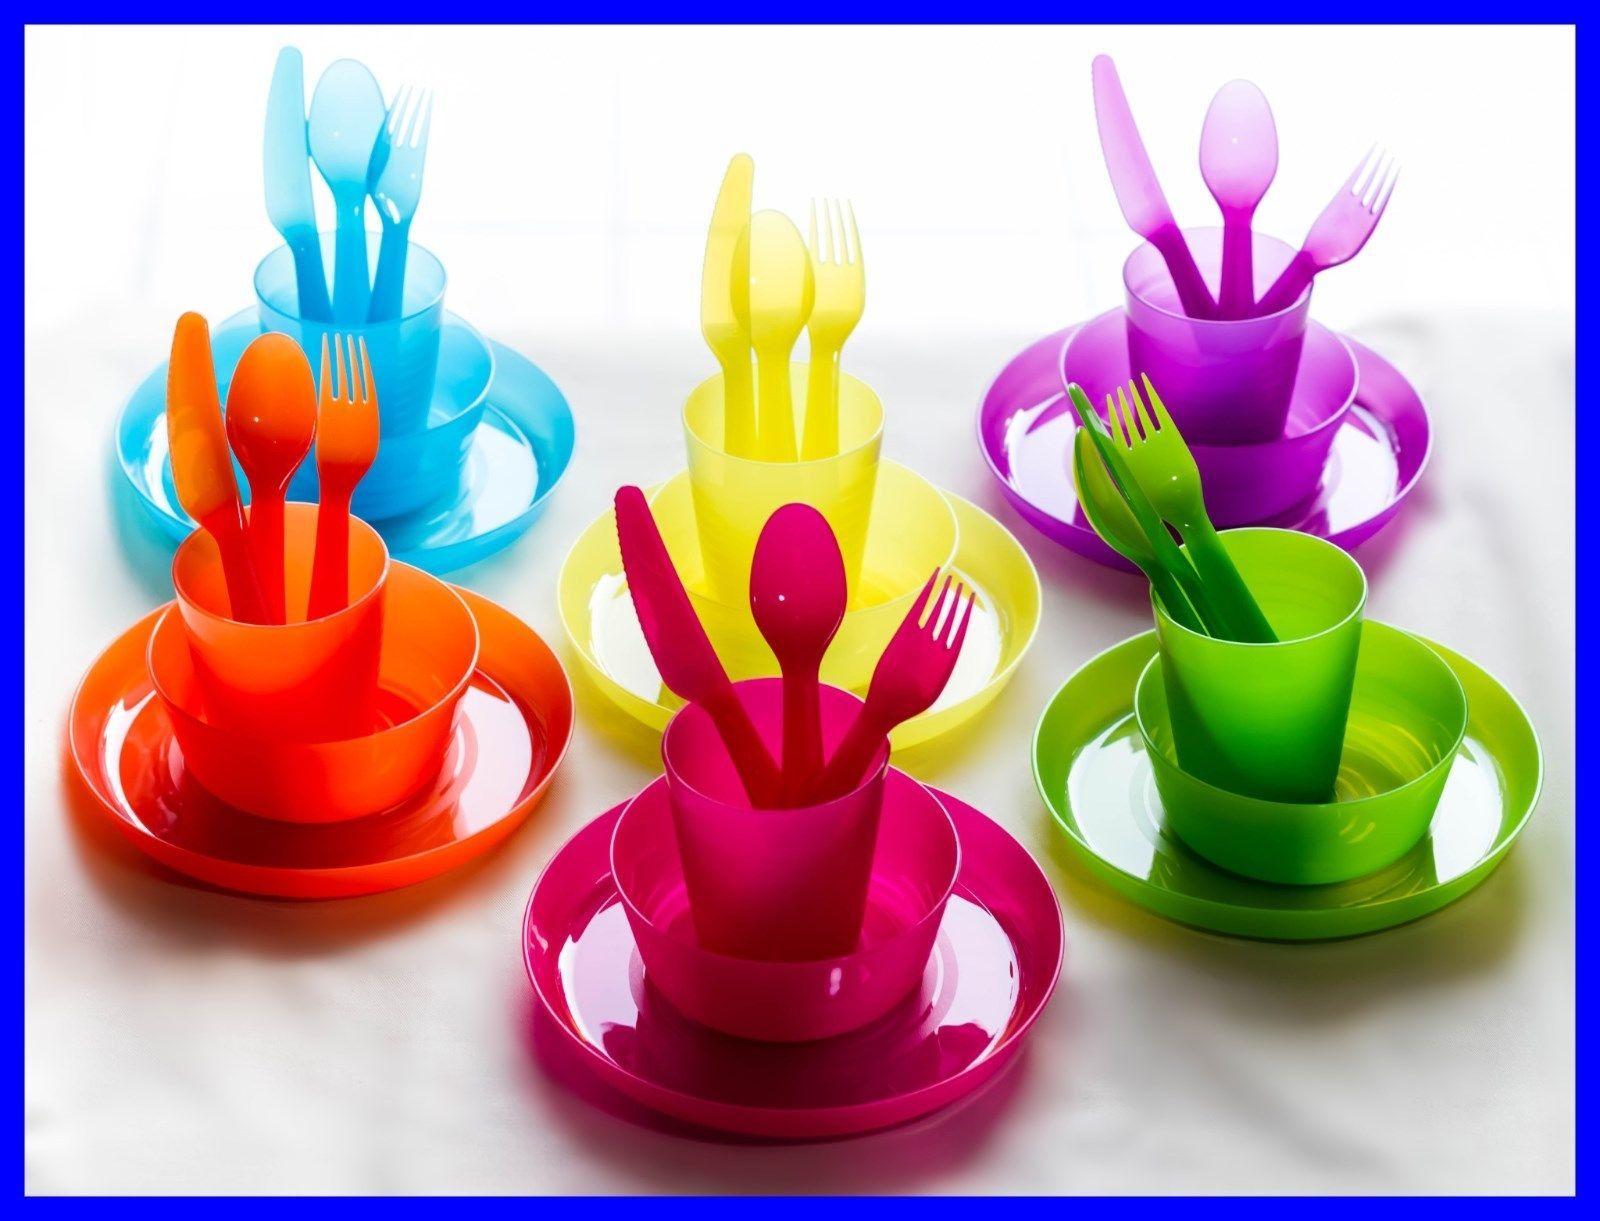 BPA Free NEW 1set PURPLE Unbreakable Reusable Dinnerware Utensils Kids Adults